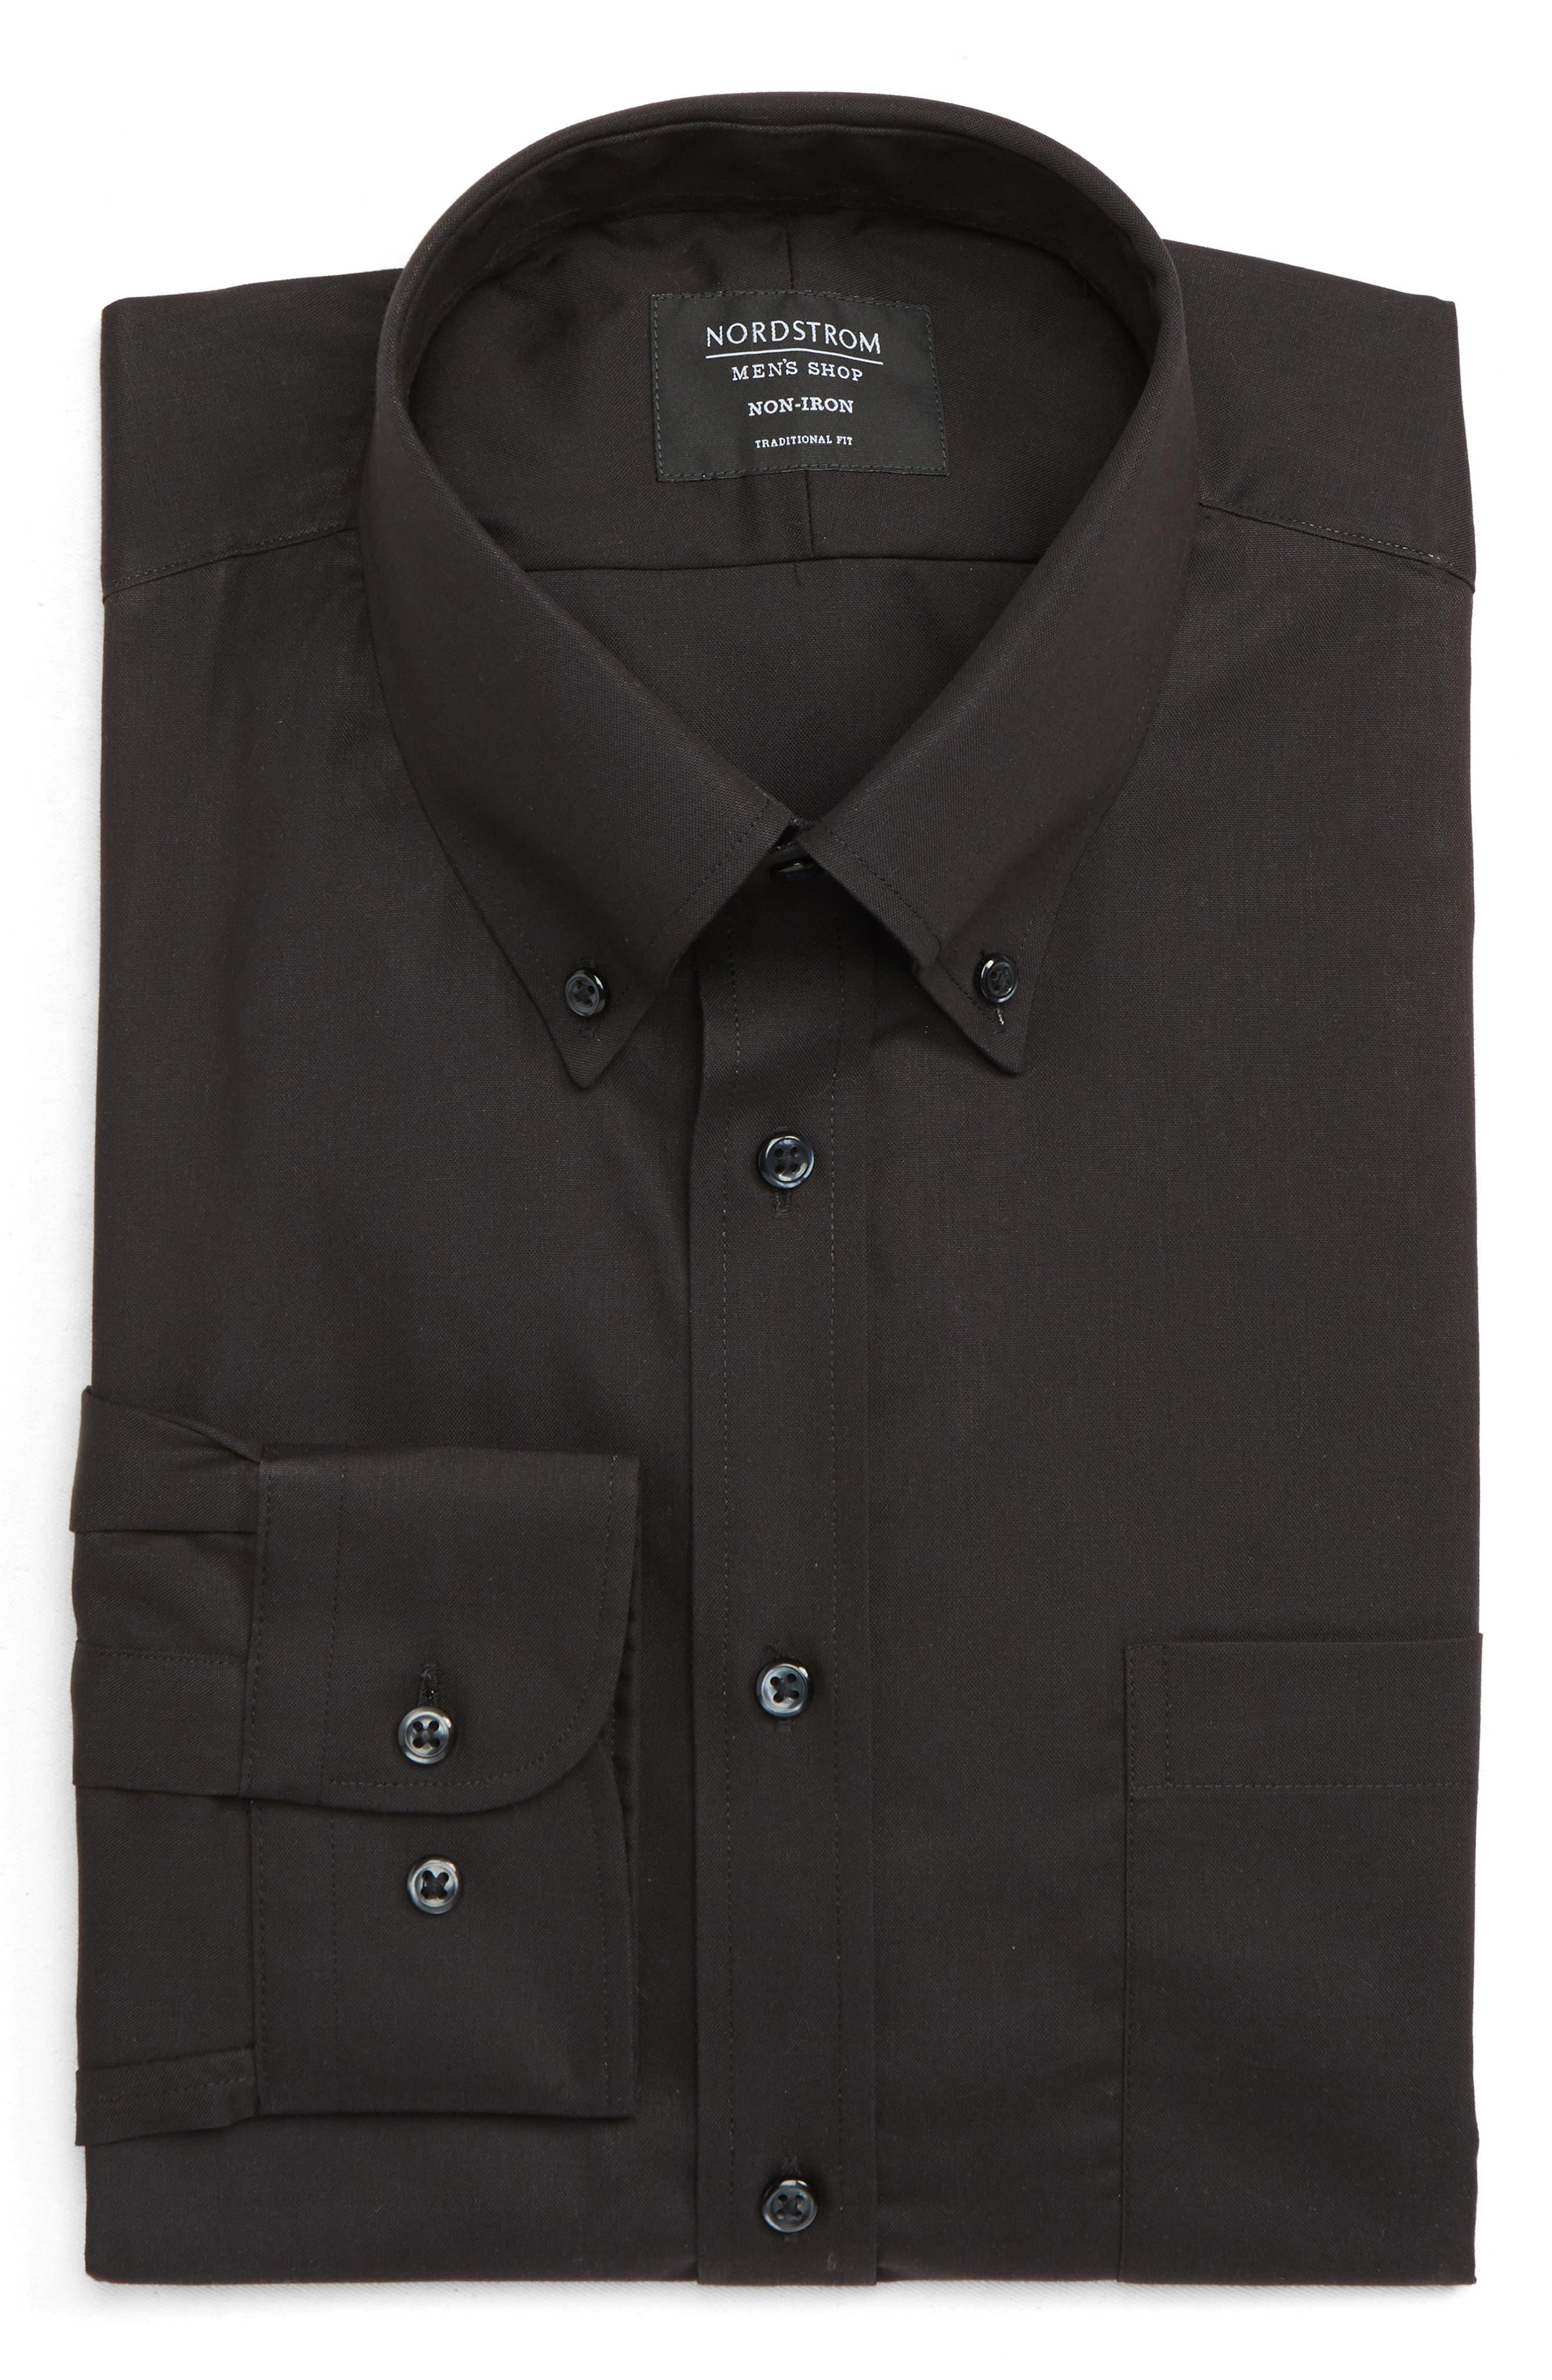 NORDSTROM MEN'S SHOP Traditional Fit Non-Iron Dress Shirt, Main, color, BLACK